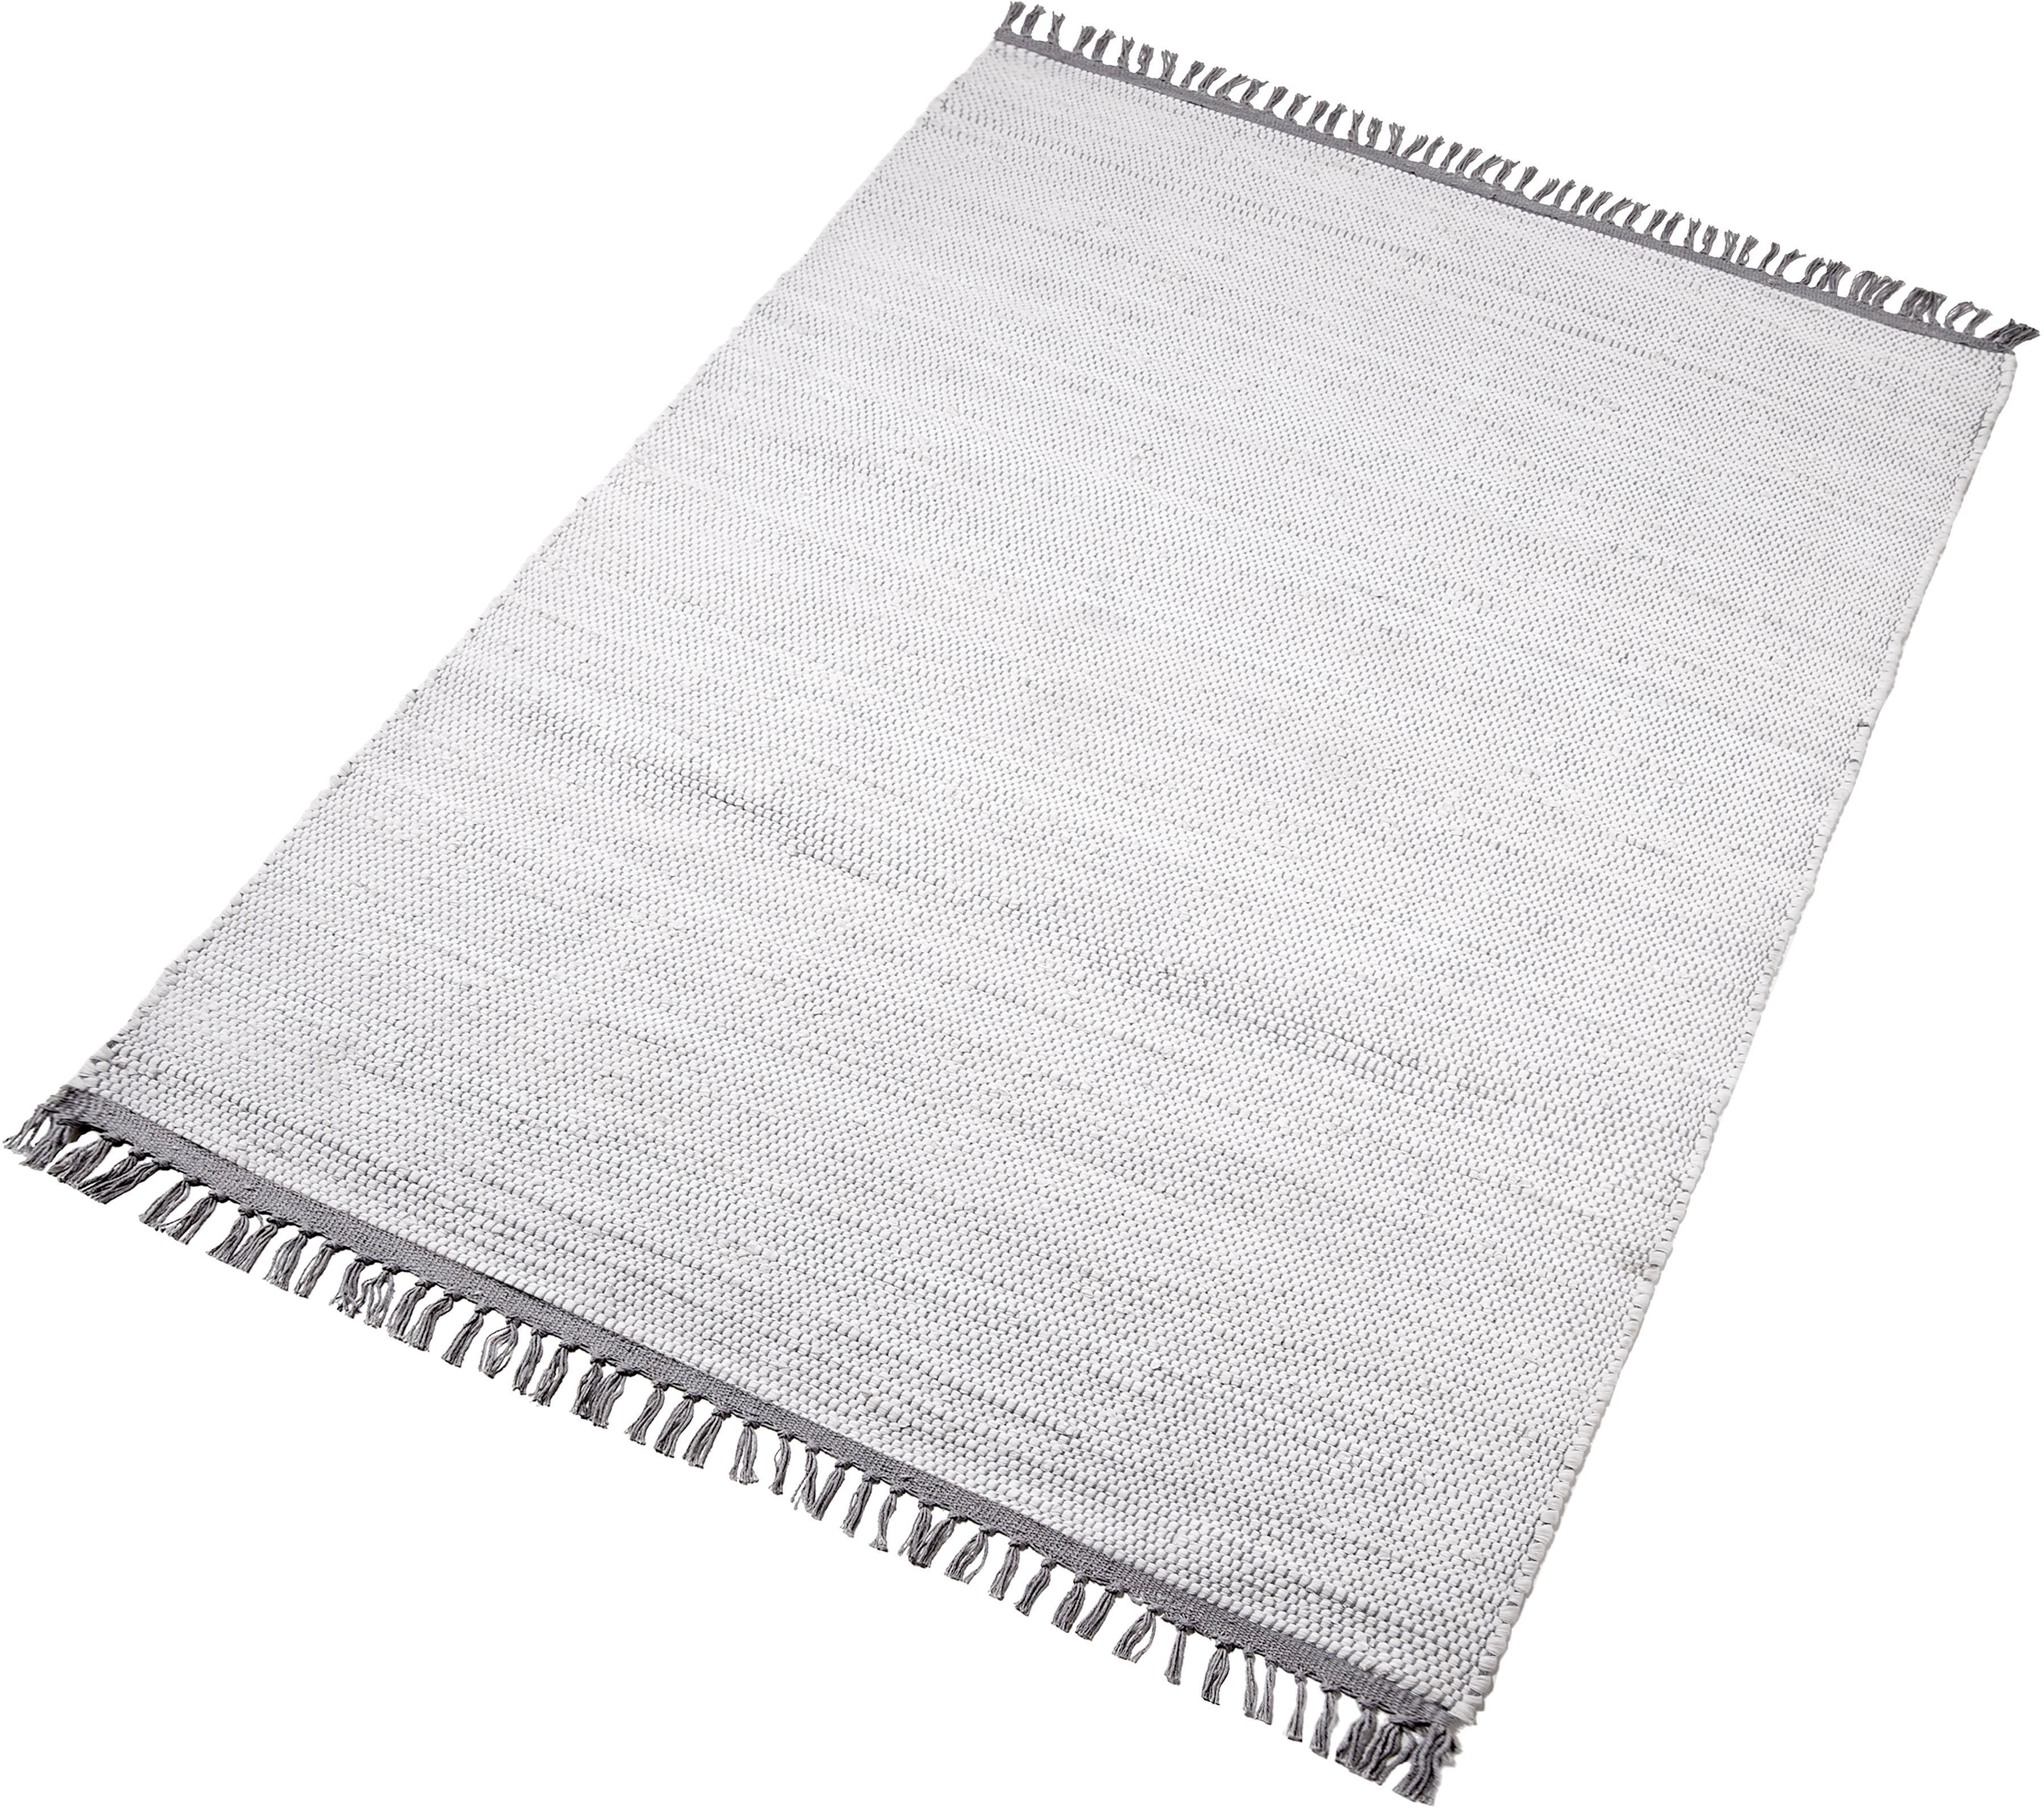 Teppich Fanoos Home affaire Collection rechteckig Höhe 5 mm handgewebt